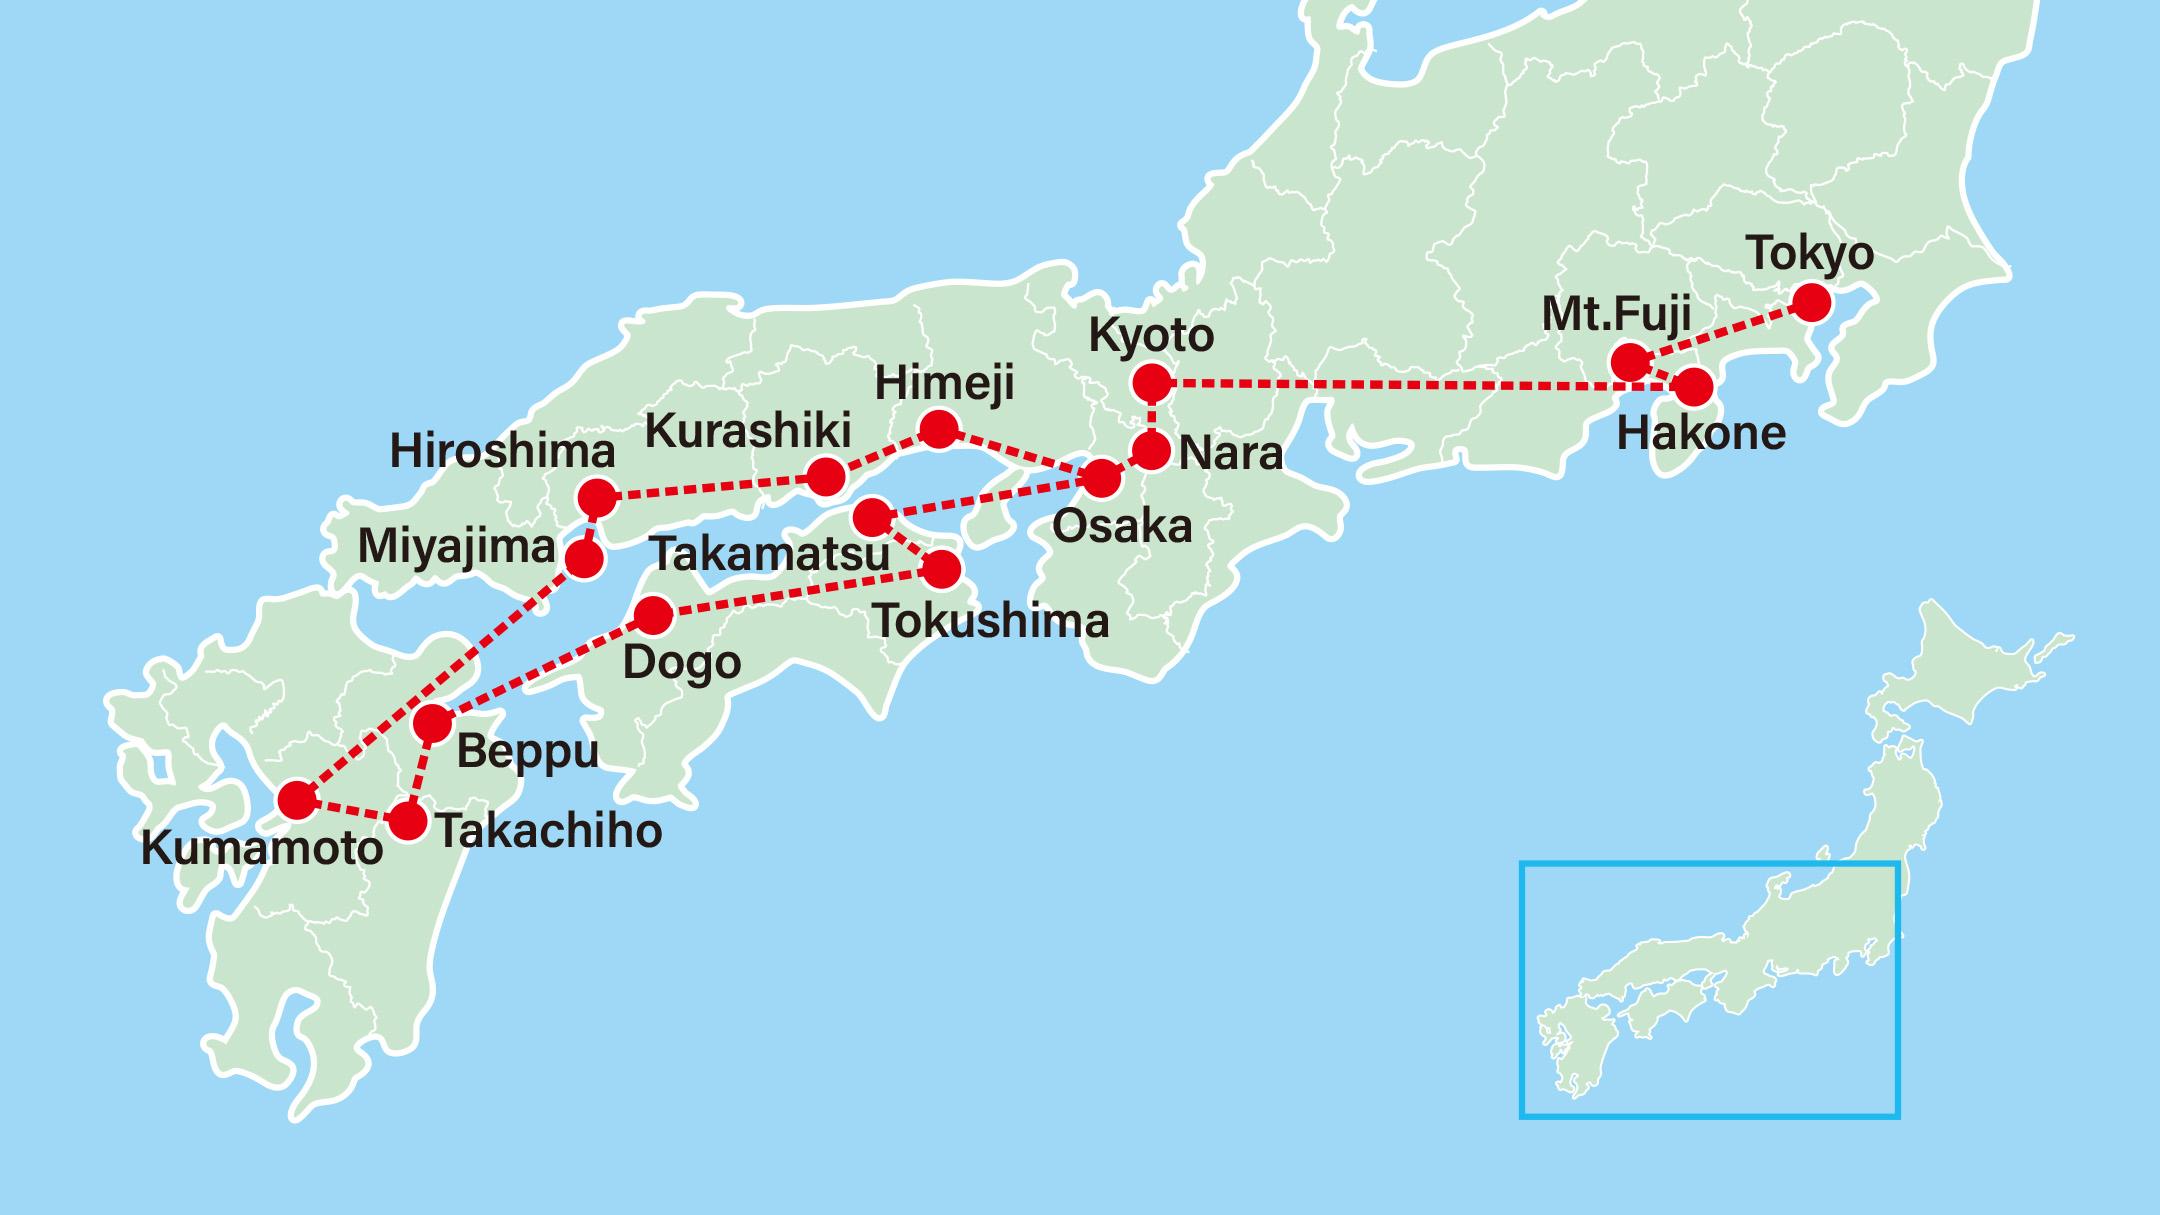 Grand Tour of Japan Ⅰ<br>Iya Valley-Himeji-Kurashiki-Hiroshima-Miyajima-Kumamoto-Takachiho-Beppu-Dogo-Tokushima-Ritsurin Garden-Osaka-Nara-Kyoto-Hakone-Mt Fuji-Tokyo-Yokohama